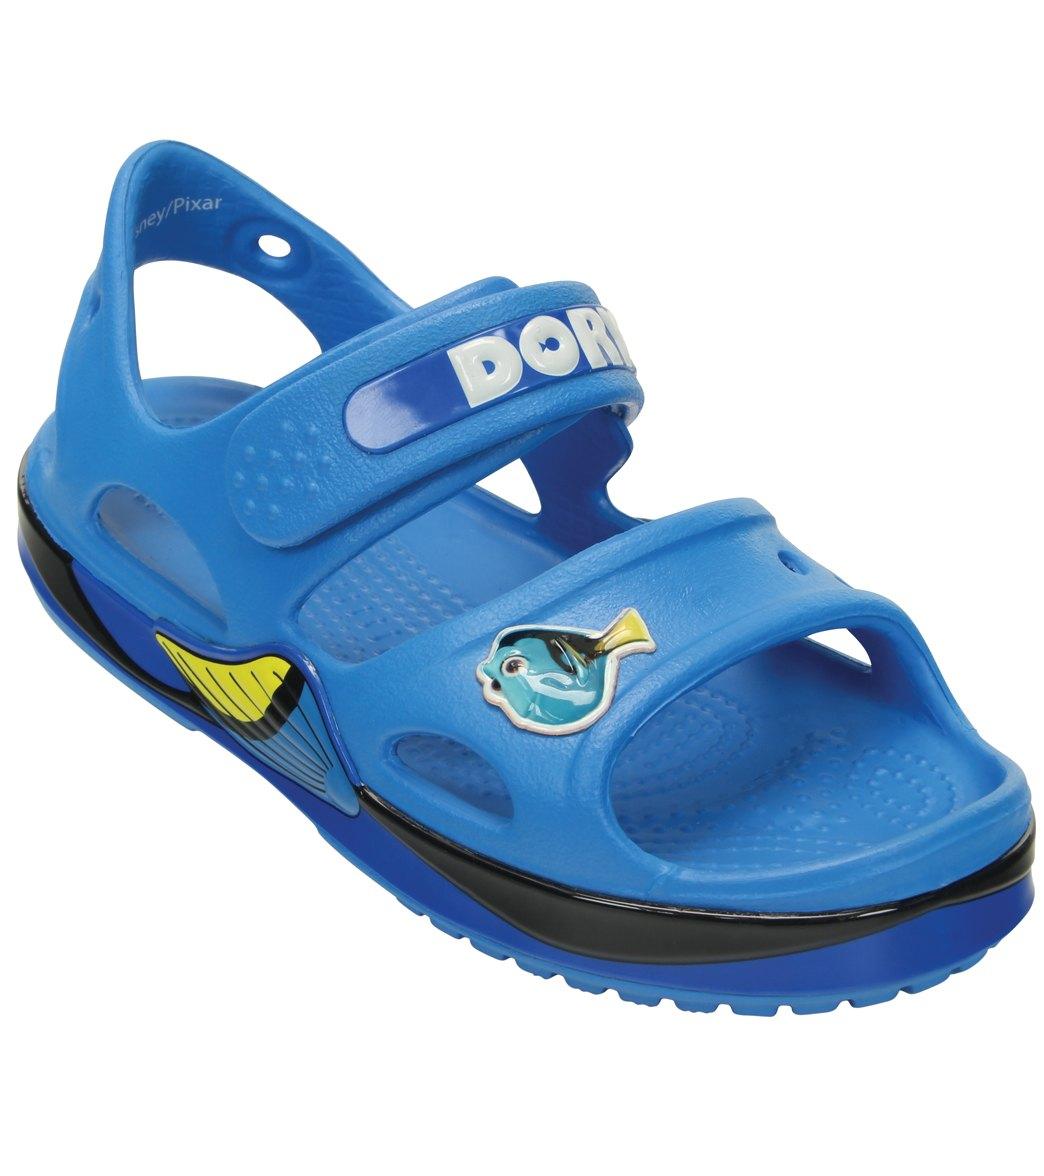 3c5c83c196ac2d Crocs Kids  Crocband II Finding Dory Sandal (Toddler  Little Kid  Big Kid